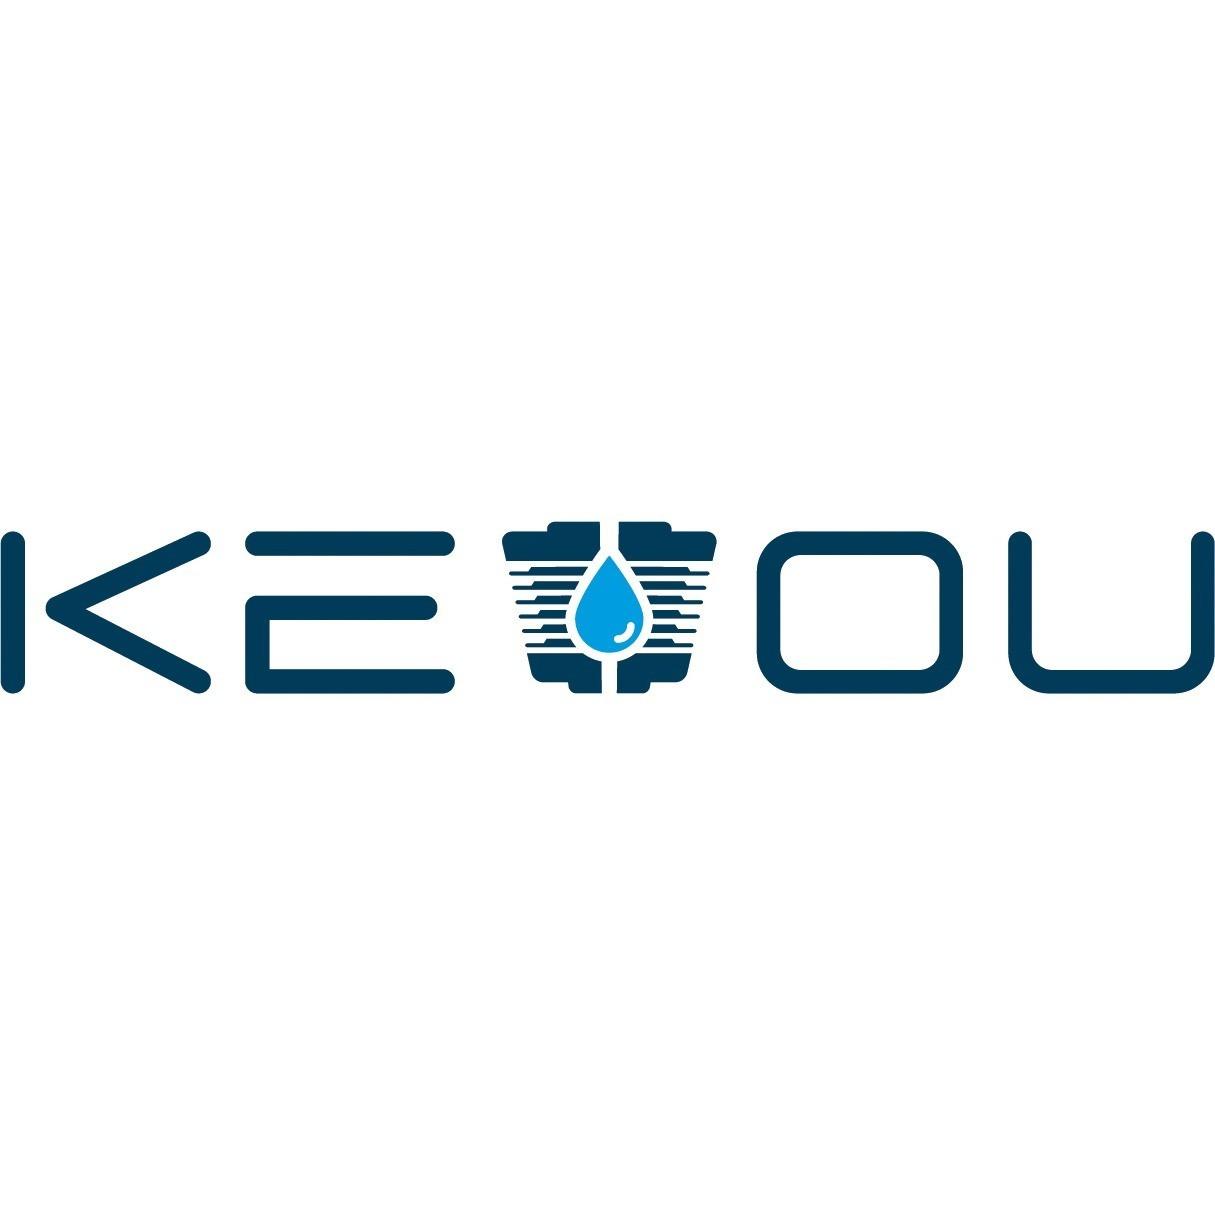 Keyou's logo